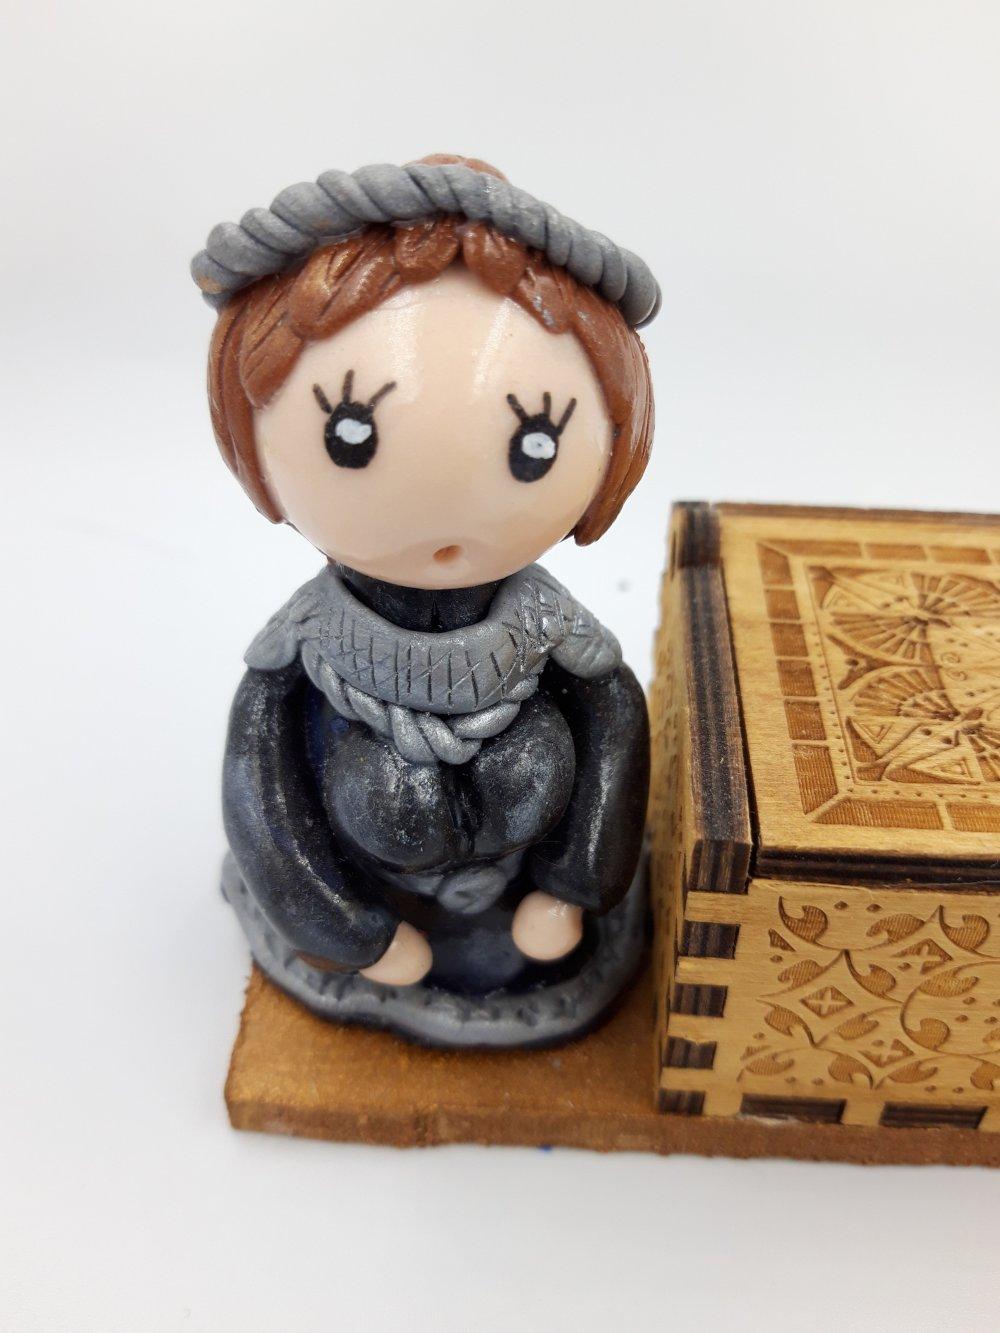 Boite à musique Game of Thrones Cerseï Lannister